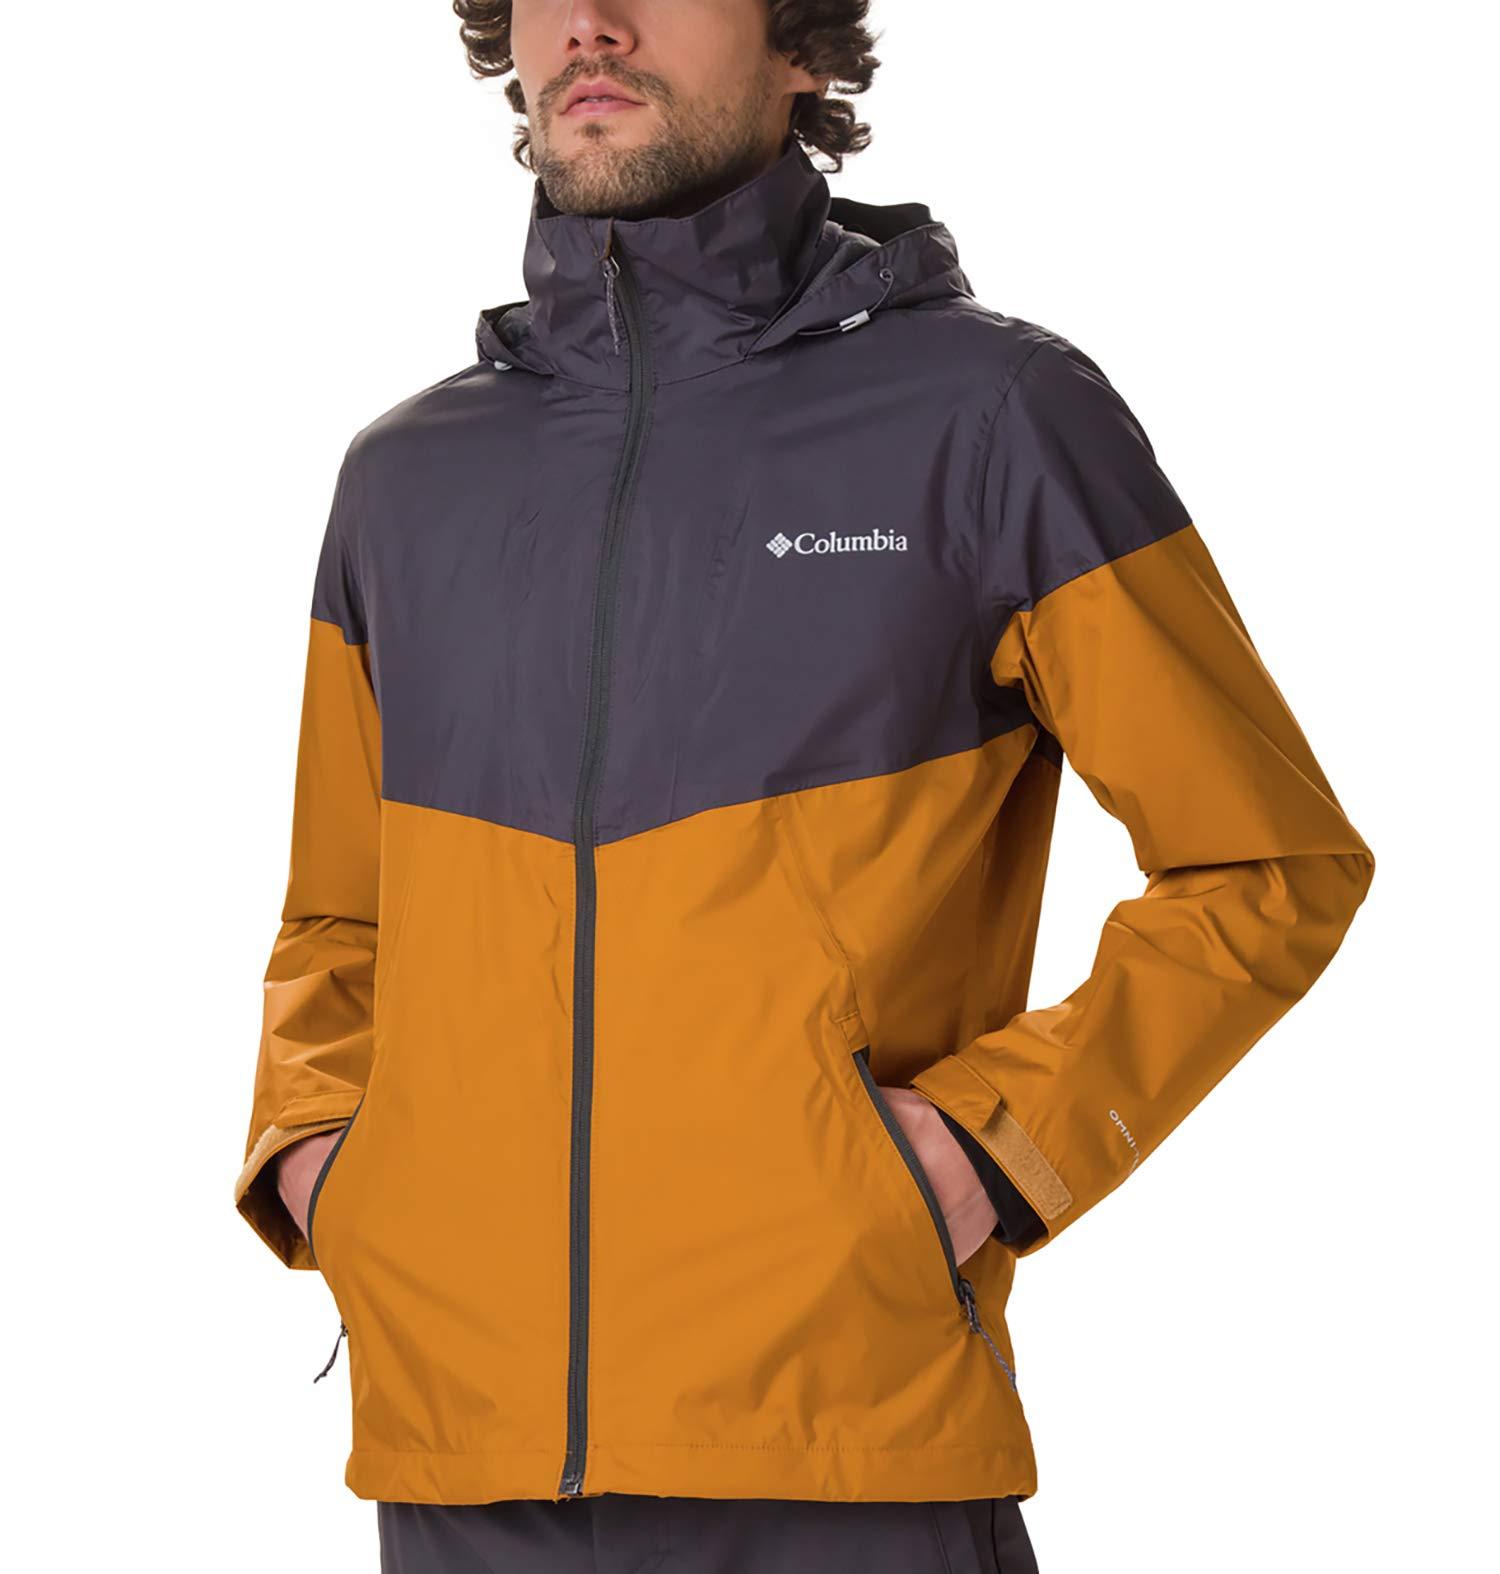 Columbia Men's Rain Jacket, Inner Limits